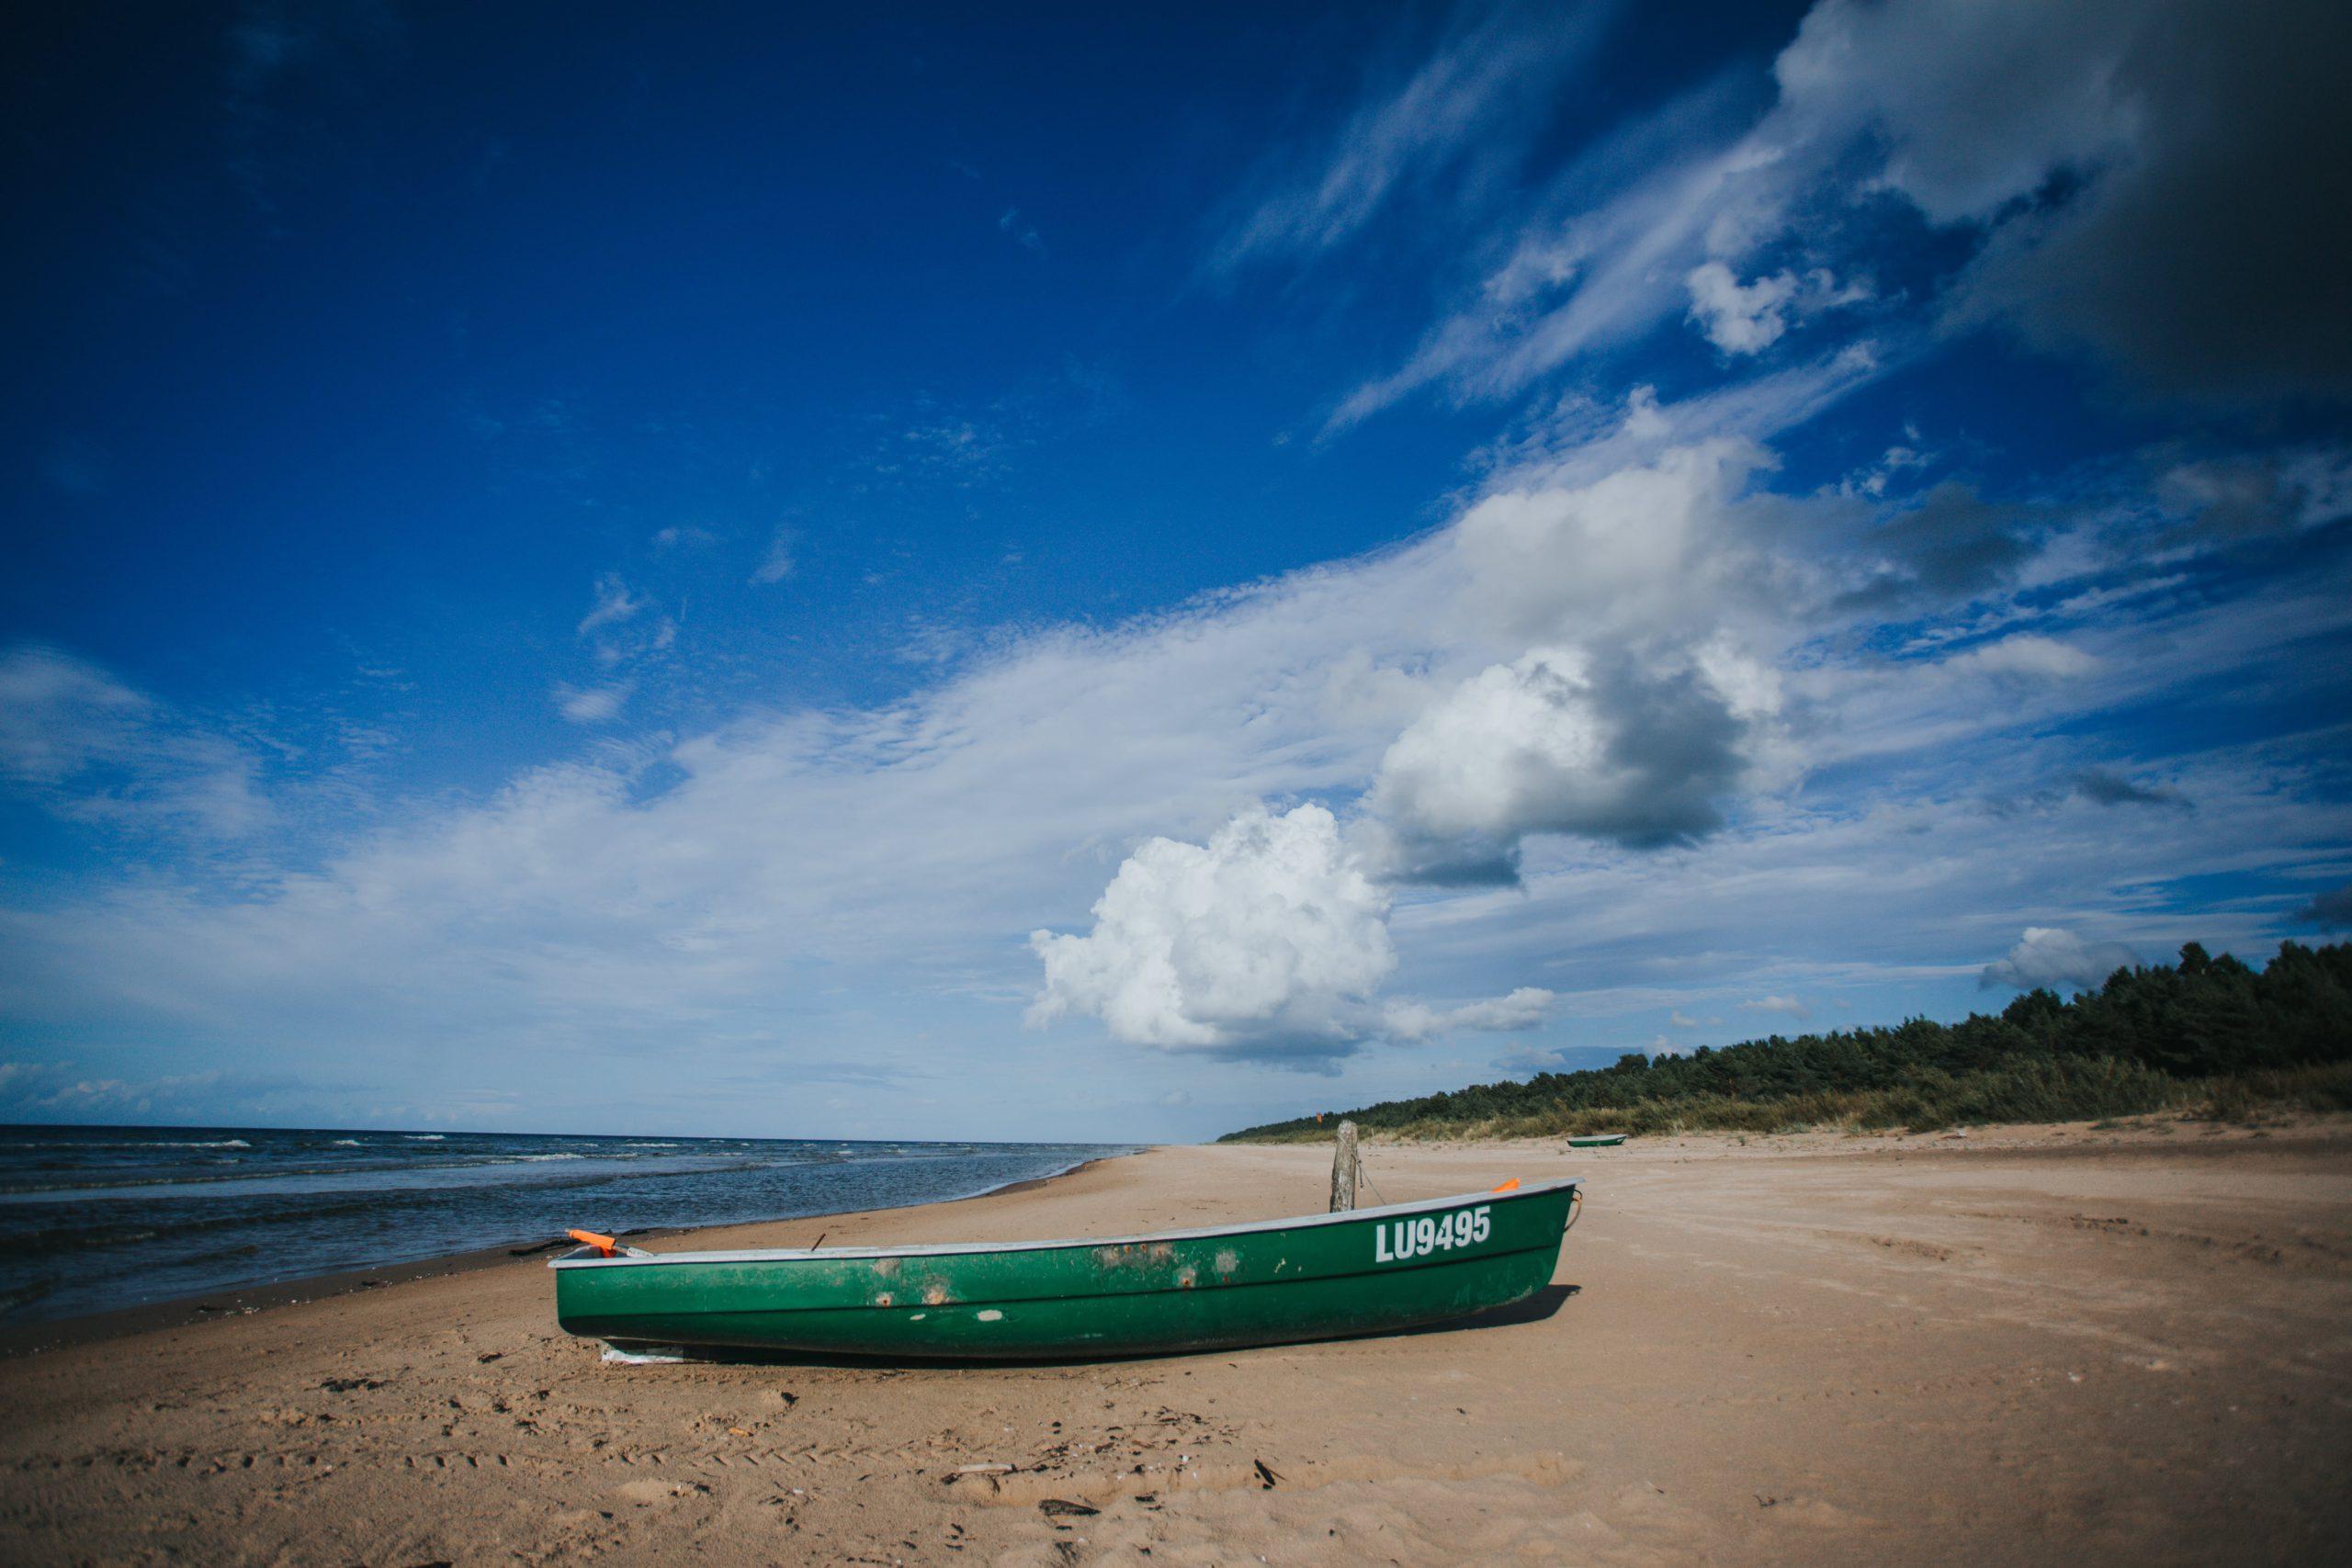 Holiday home Nitaiga boat on the beach